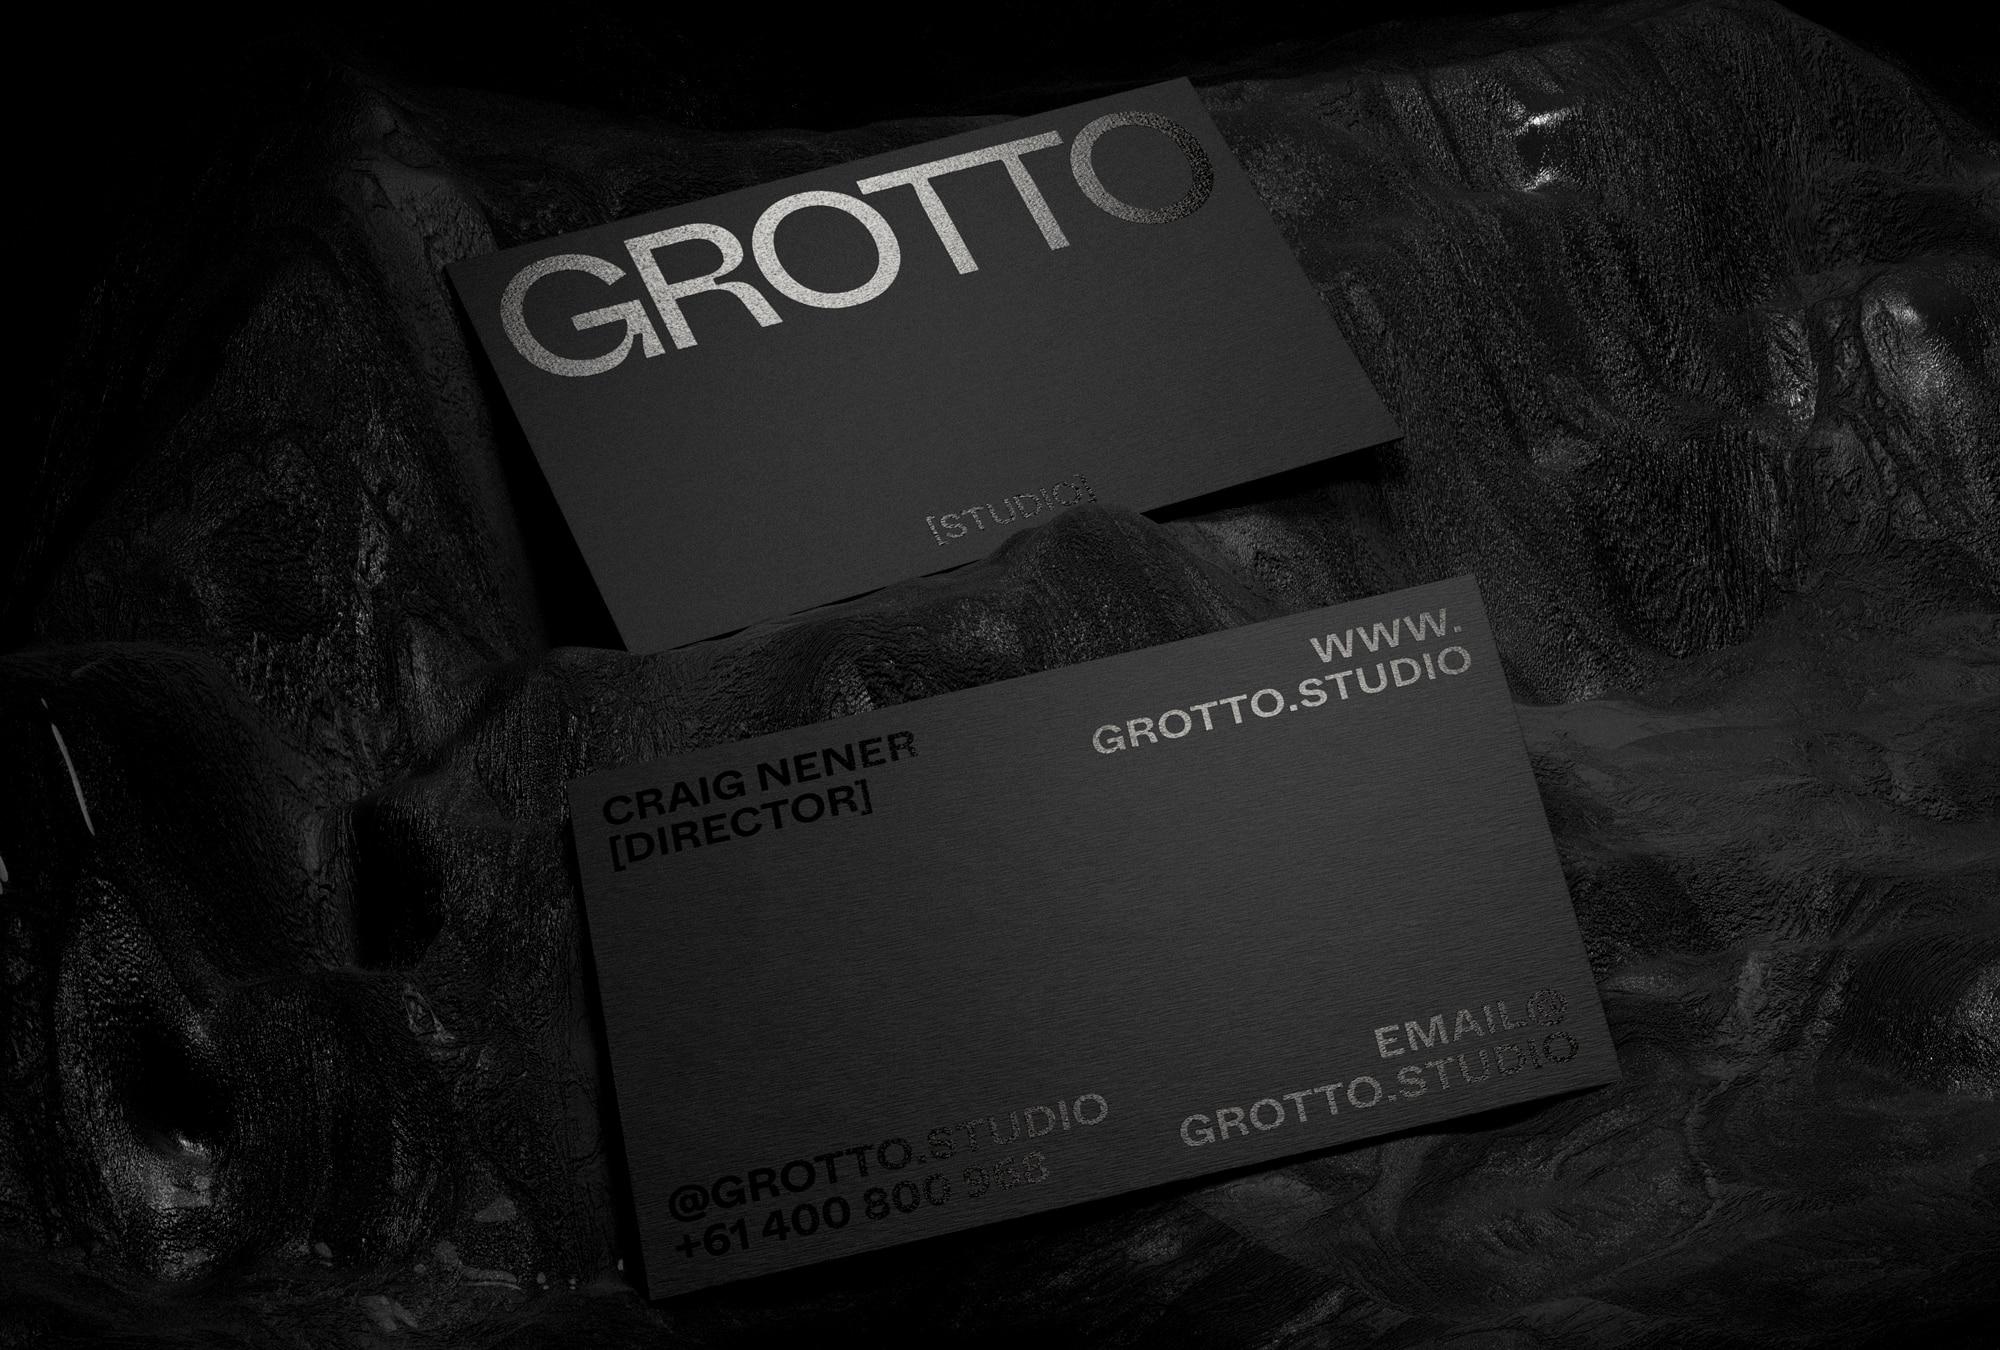 GROTTO_WEBCS_2-1